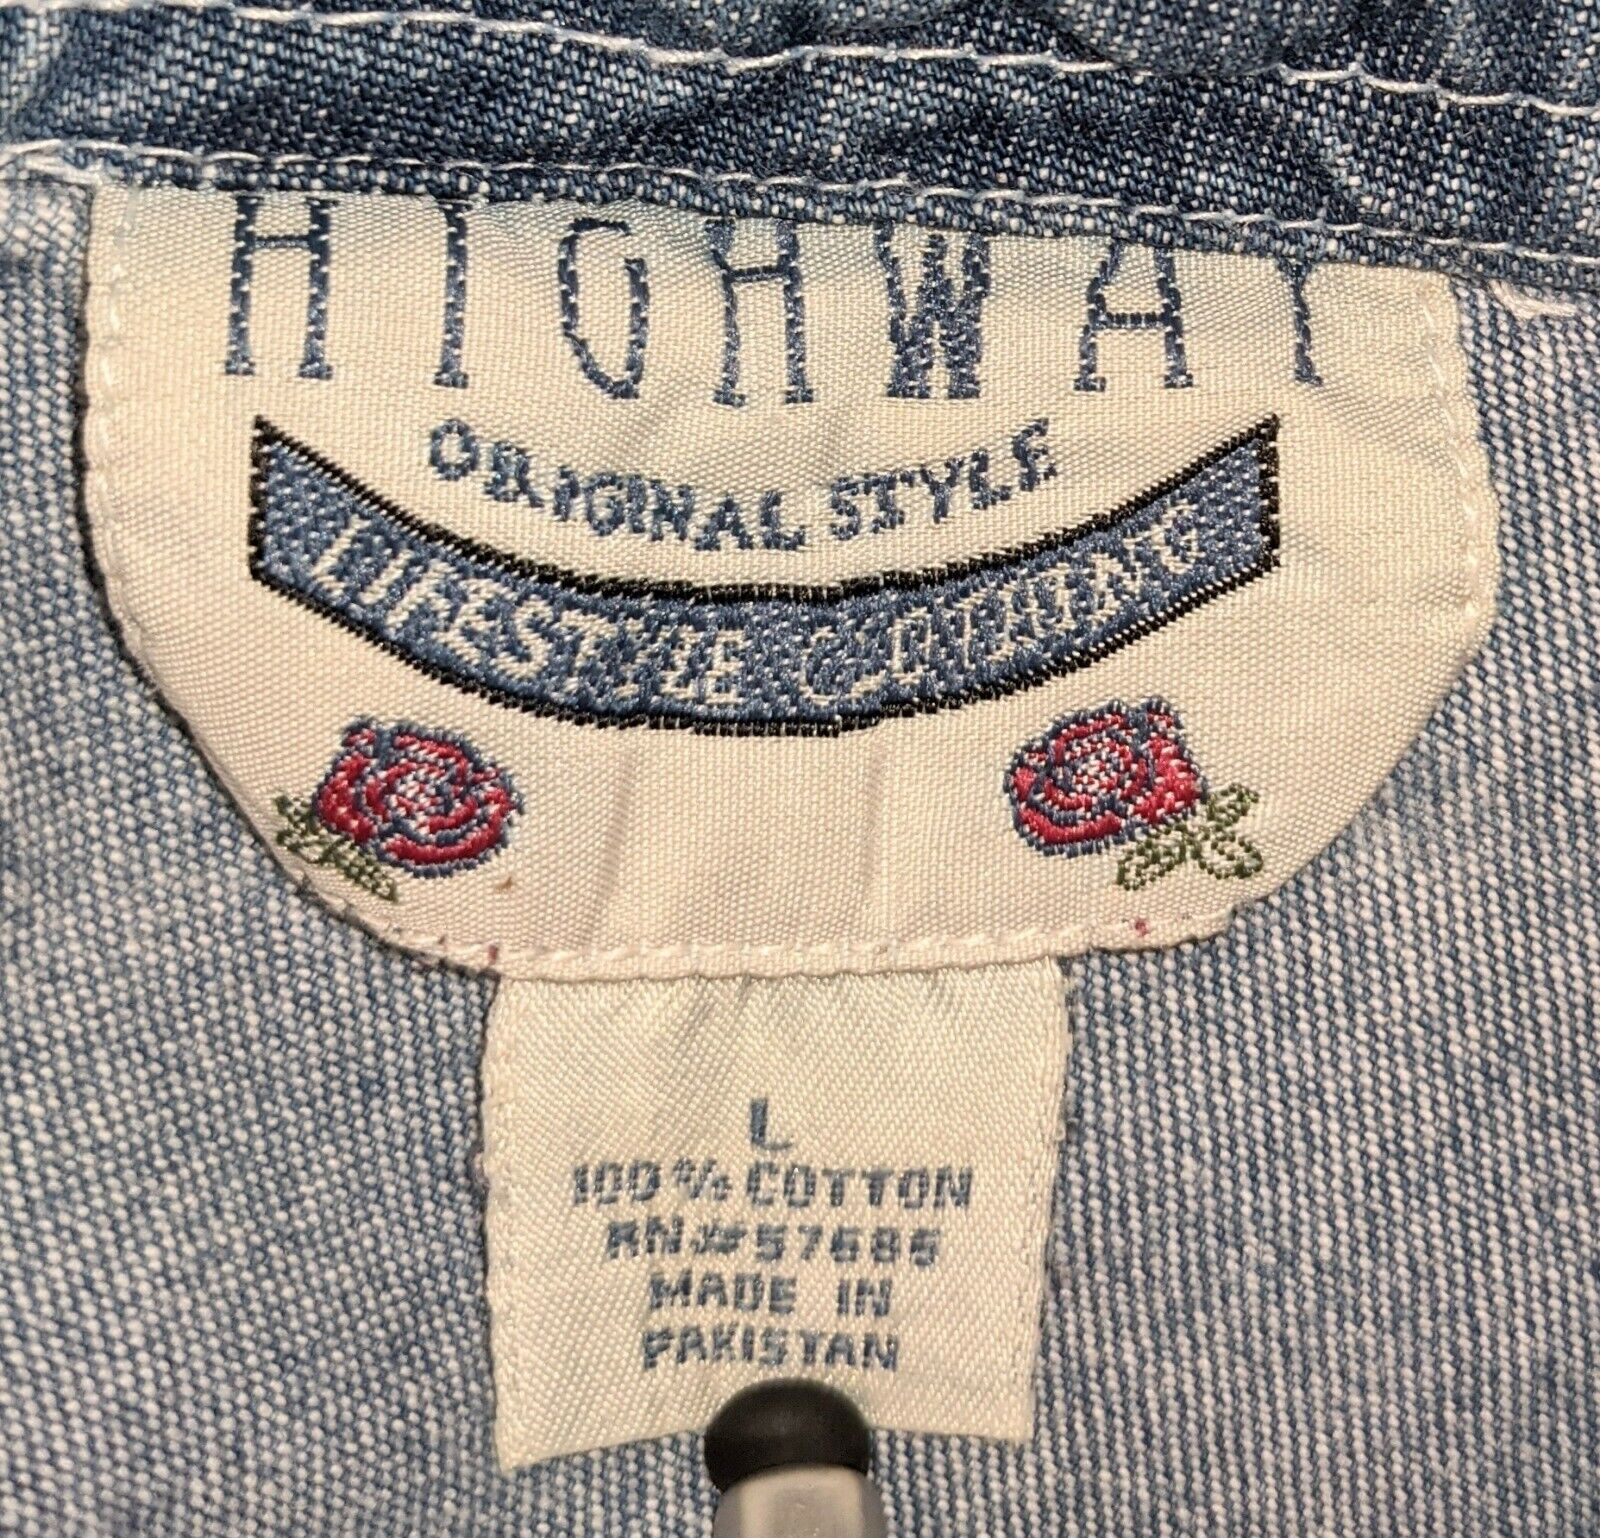 Vntg 80's-90's Highway denim apron pinafore halte… - image 3